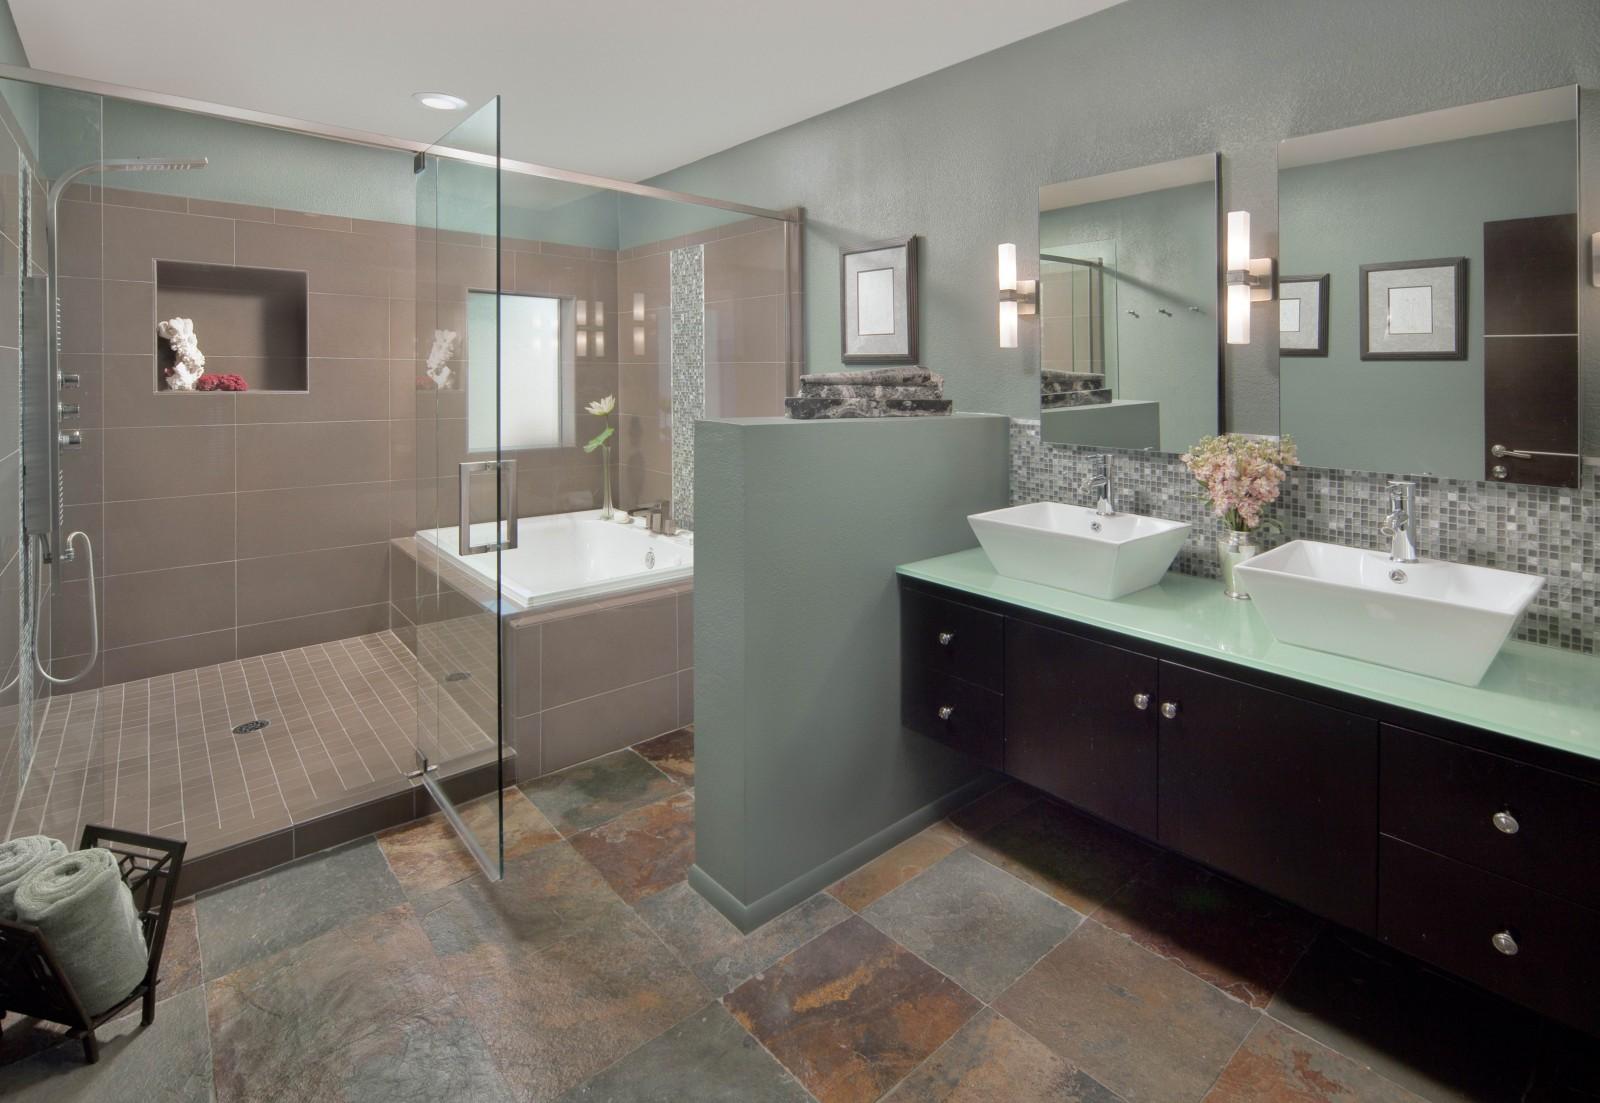 Elegant Shower Ideas for Master Bathroom - HomesFeed on Main Bathroom Ideas  id=57175